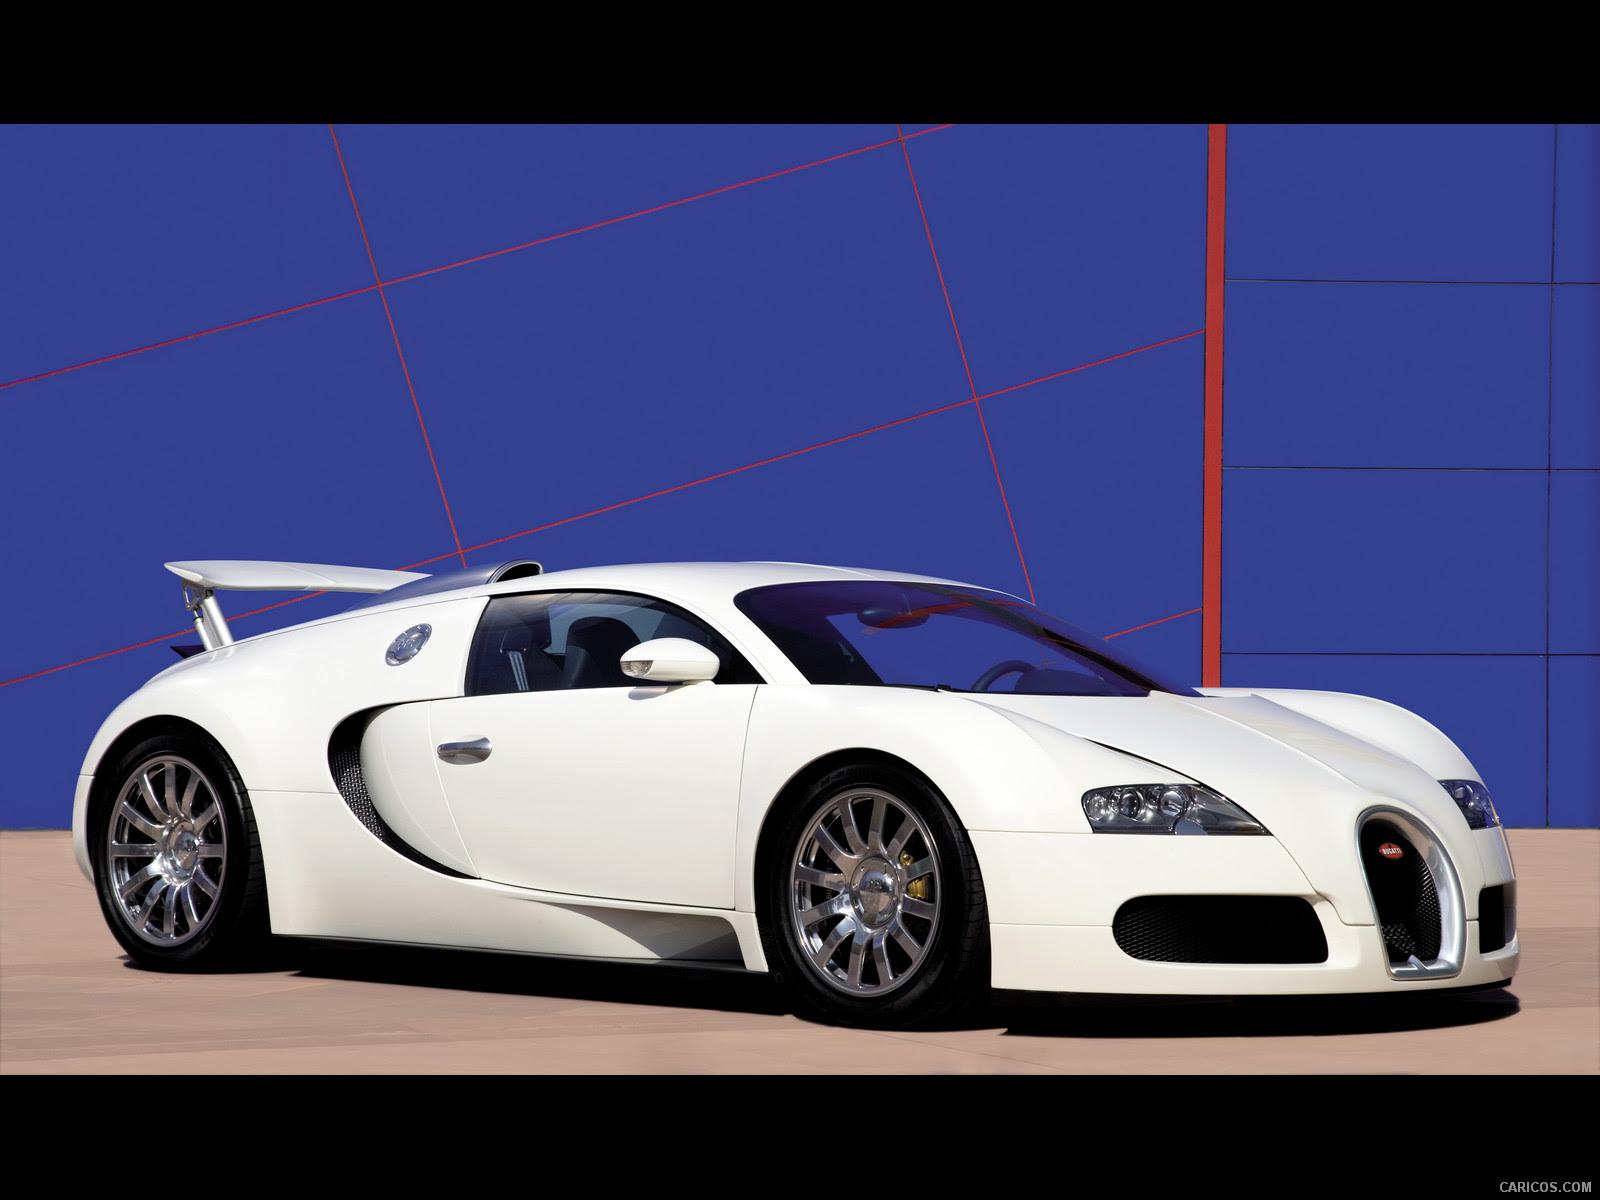 Bugatti Veyron Grand Sport White - Front | Wallpaper #142 | 1600x1200